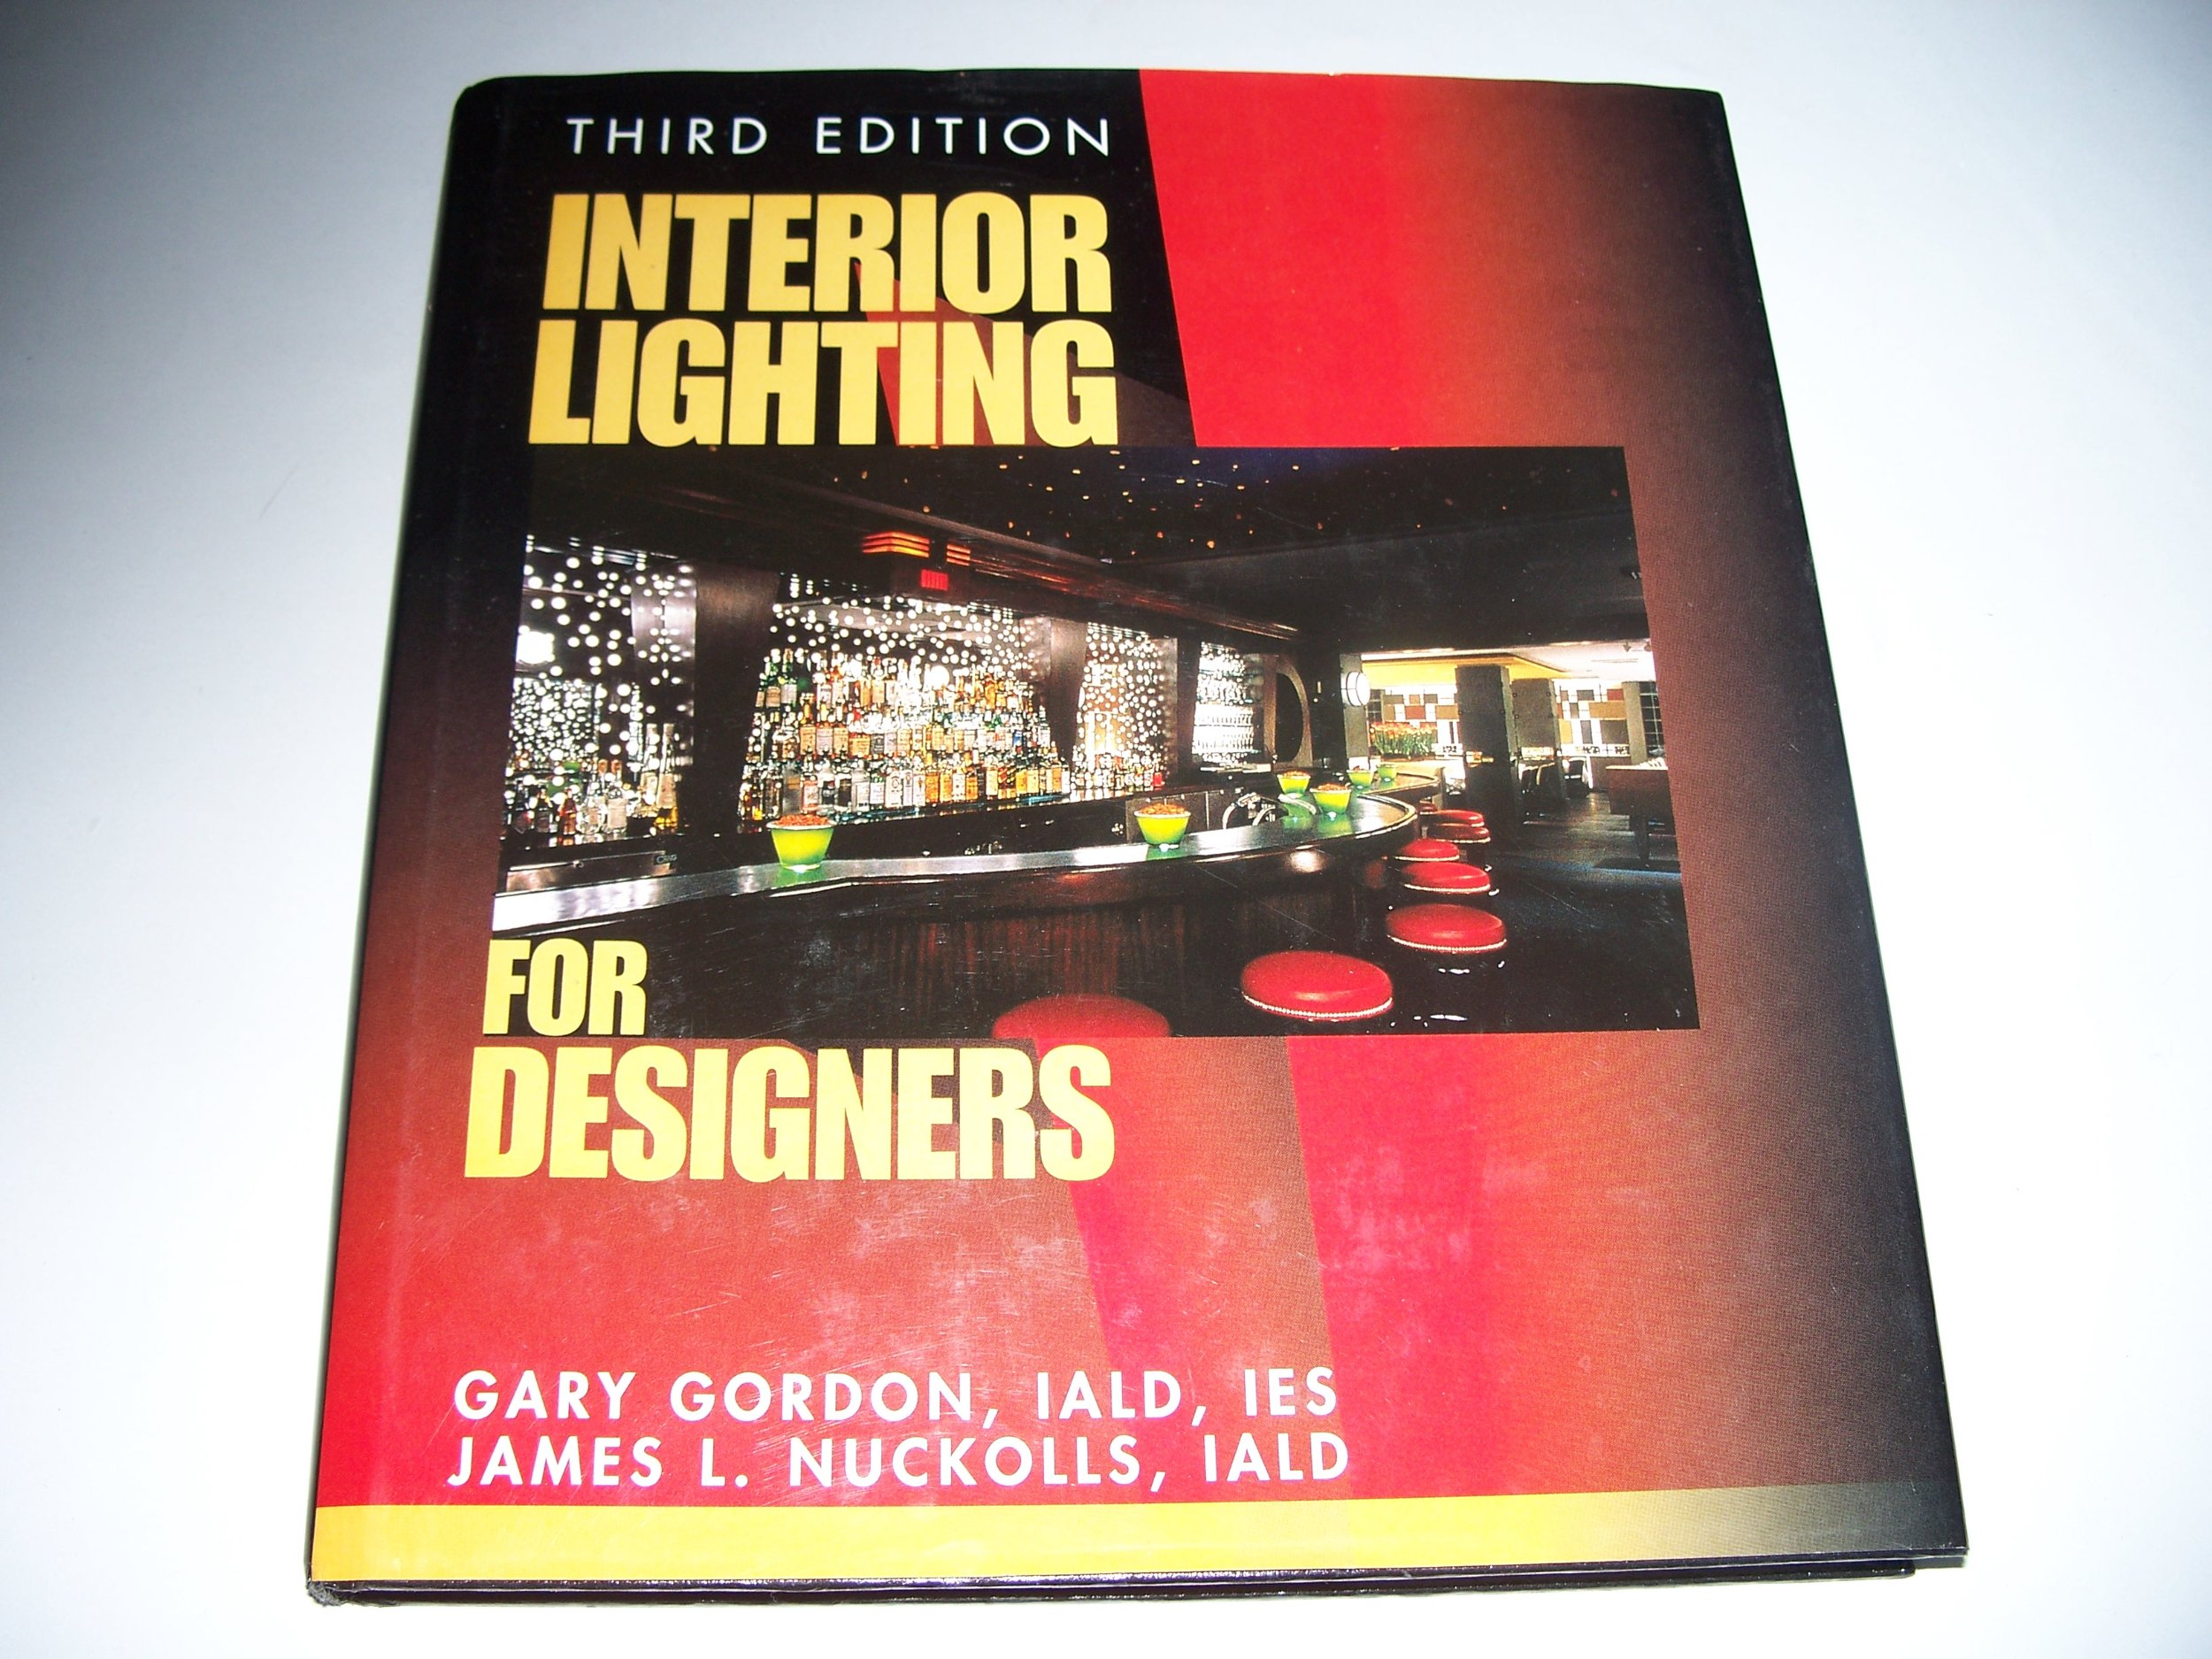 Interior lighting for designers third edition james l